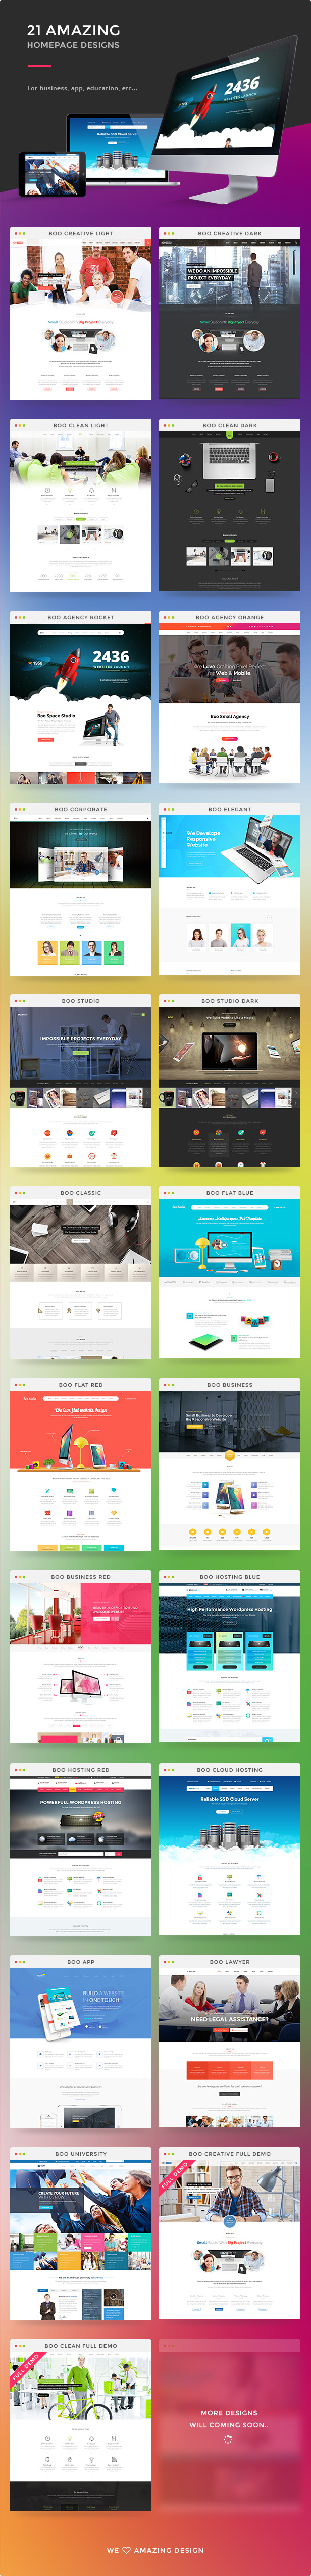 21 amazing homepage designs